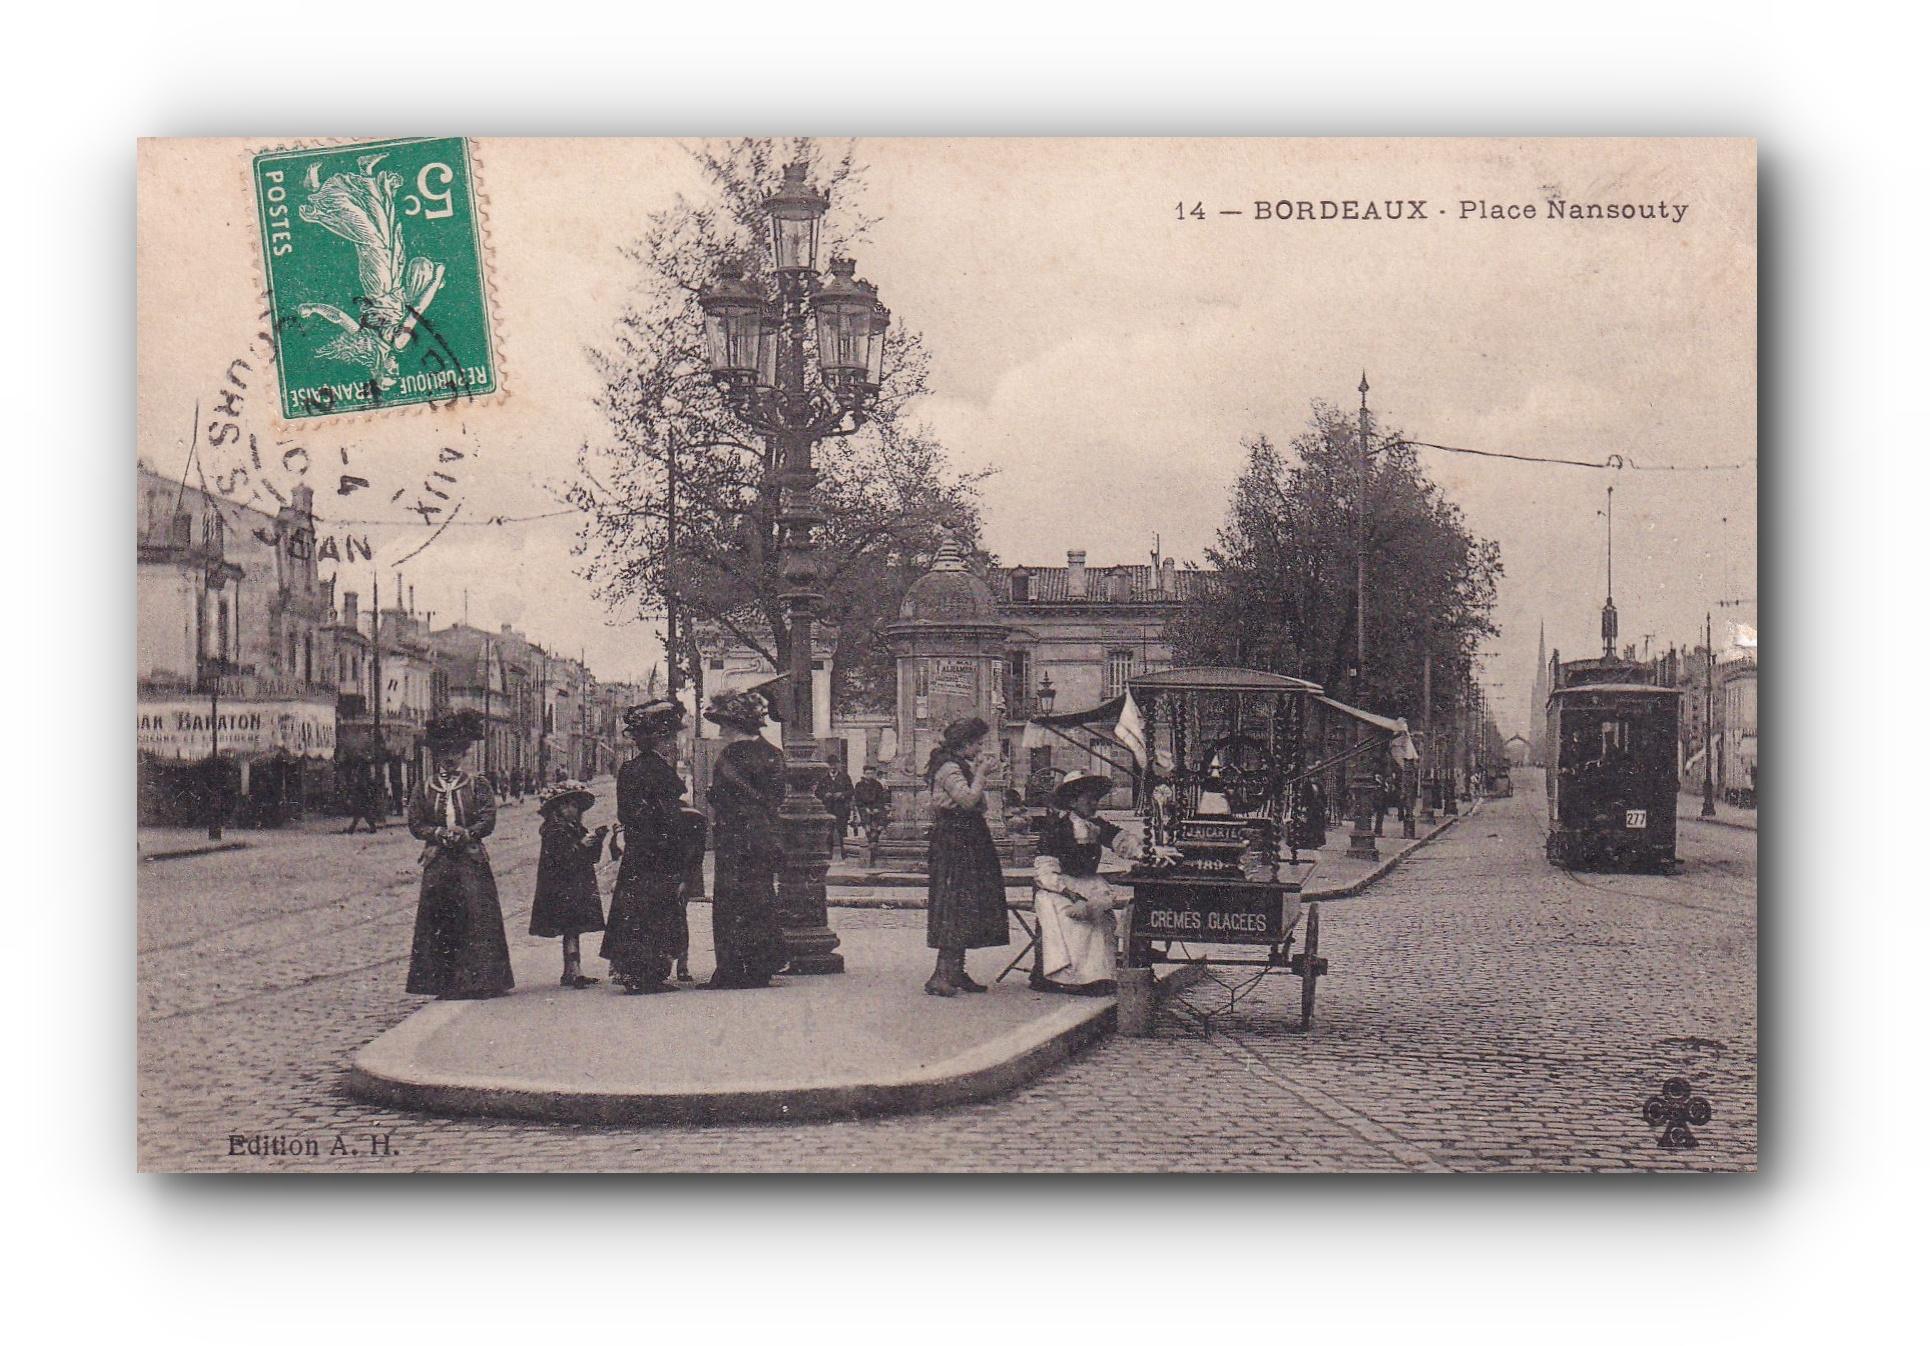 BORDEAUX - La marchande de glaces - Die Eisverkäuferin - The ice cream seller